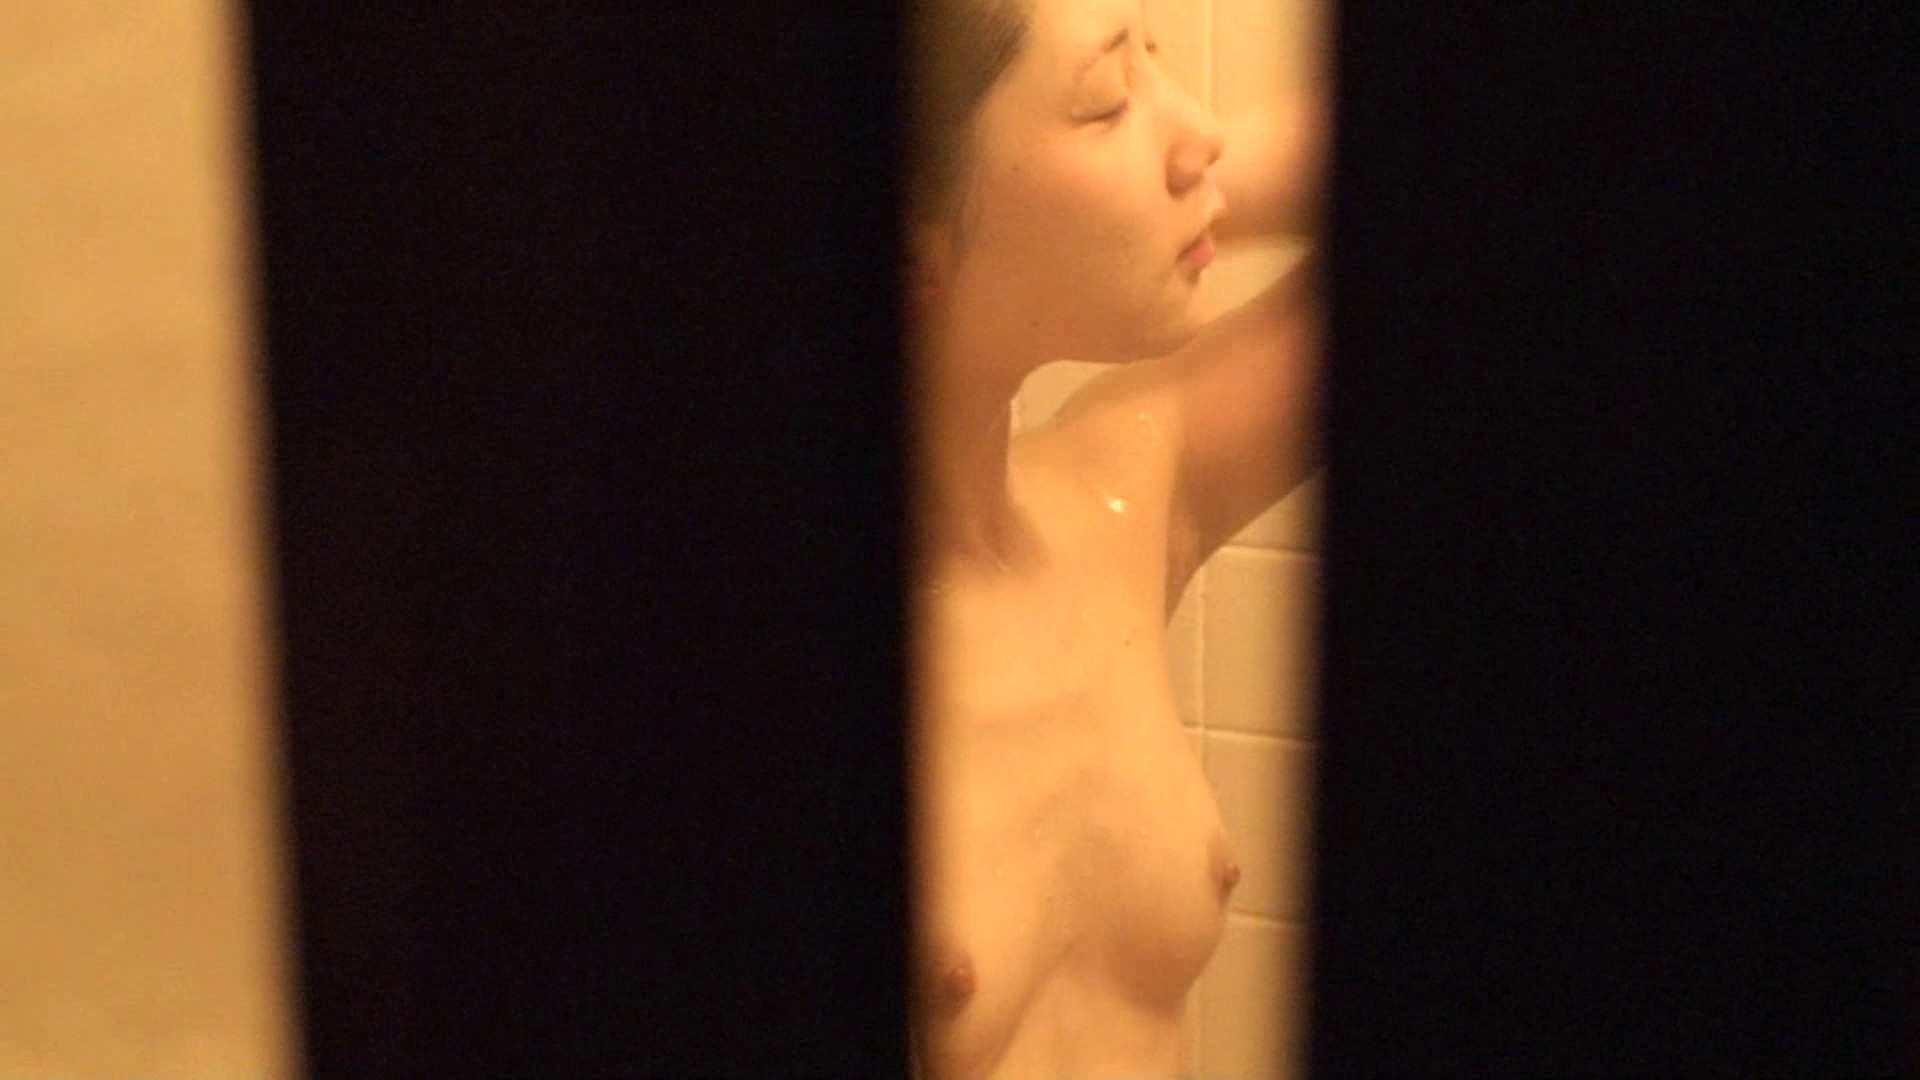 vol.02超可愛すぎる彼女の裸体をハイビジョンで!至近距離での眺め最高! OLの実態 盗み撮りオマンコ動画キャプチャ 103pic 72